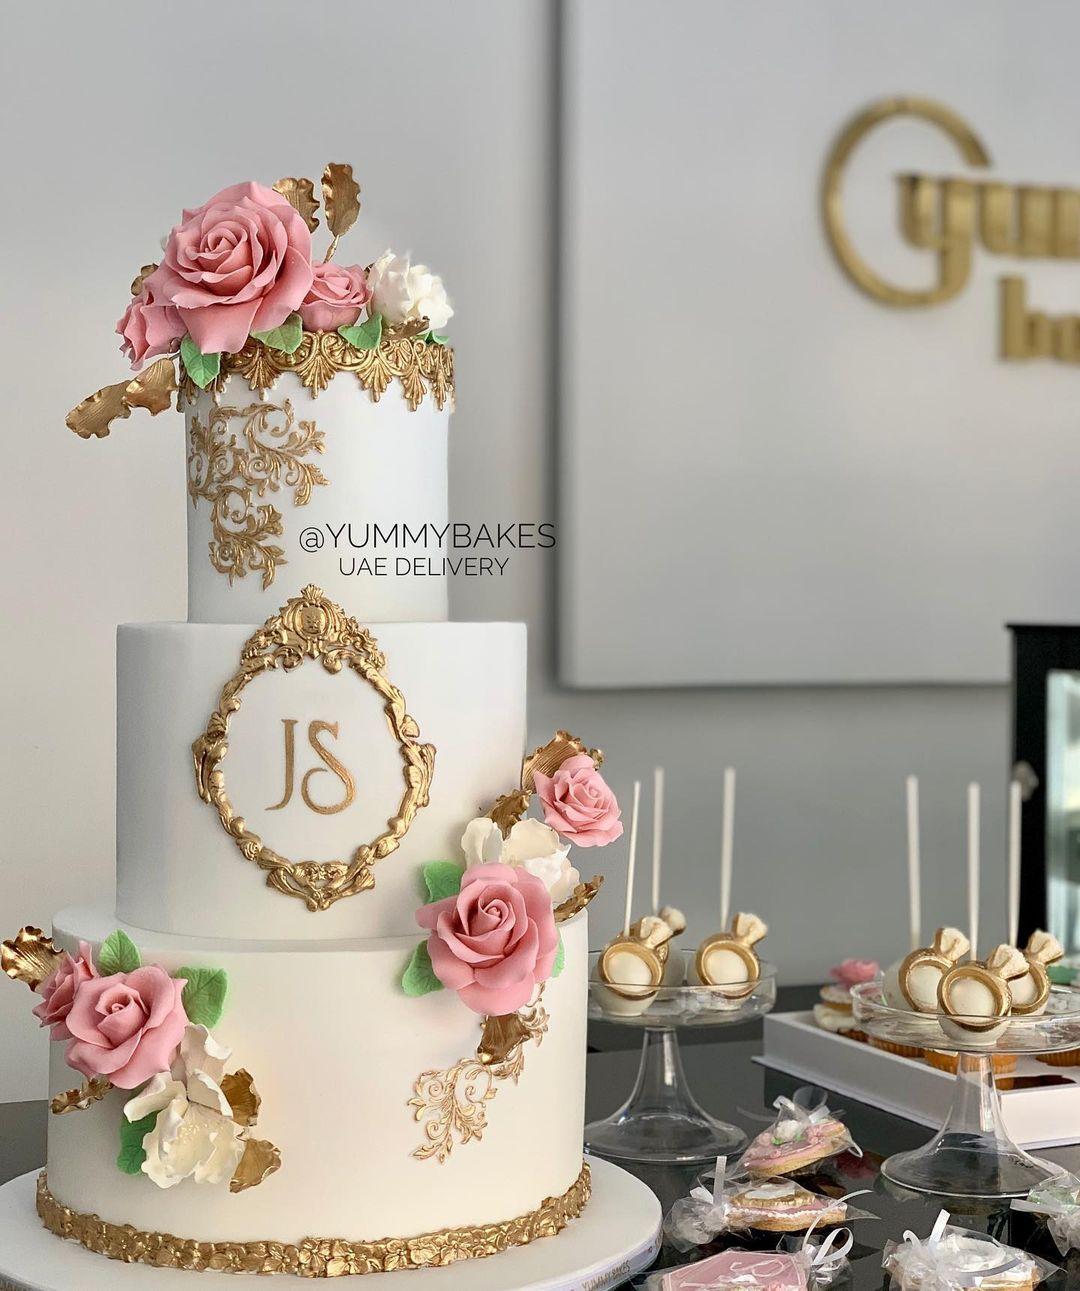 Wedding Cake Wedding Dessert Table كيكه عرس كيكه ملجه كيكه خطوبه كوشه Engagement Cake Wedding Cake Ide Place Card Holders Table Decorations Decor